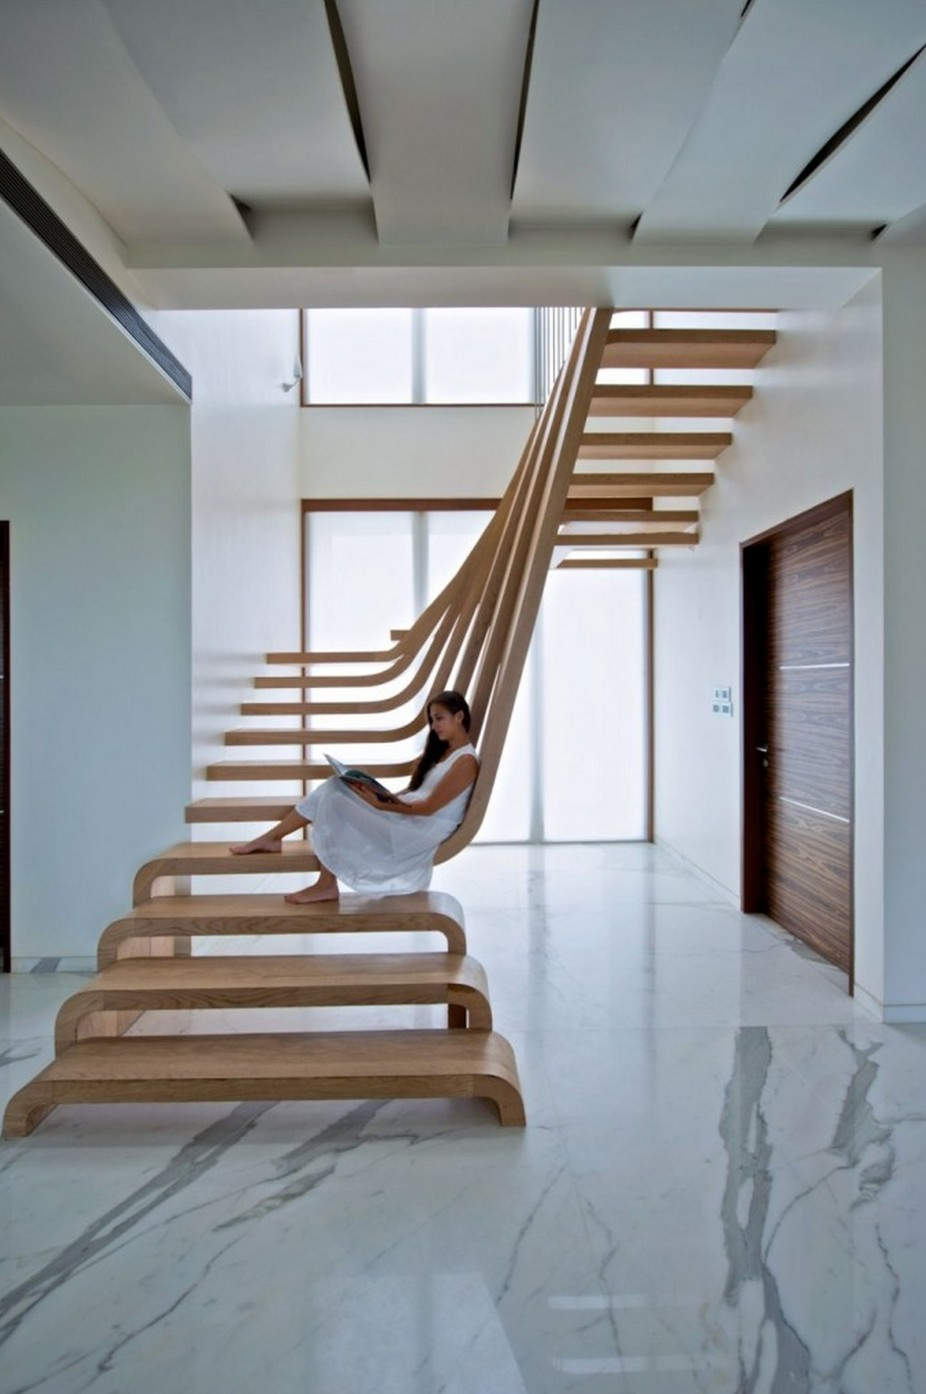 tr s bel escalier design mumbai blog d co design. Black Bedroom Furniture Sets. Home Design Ideas